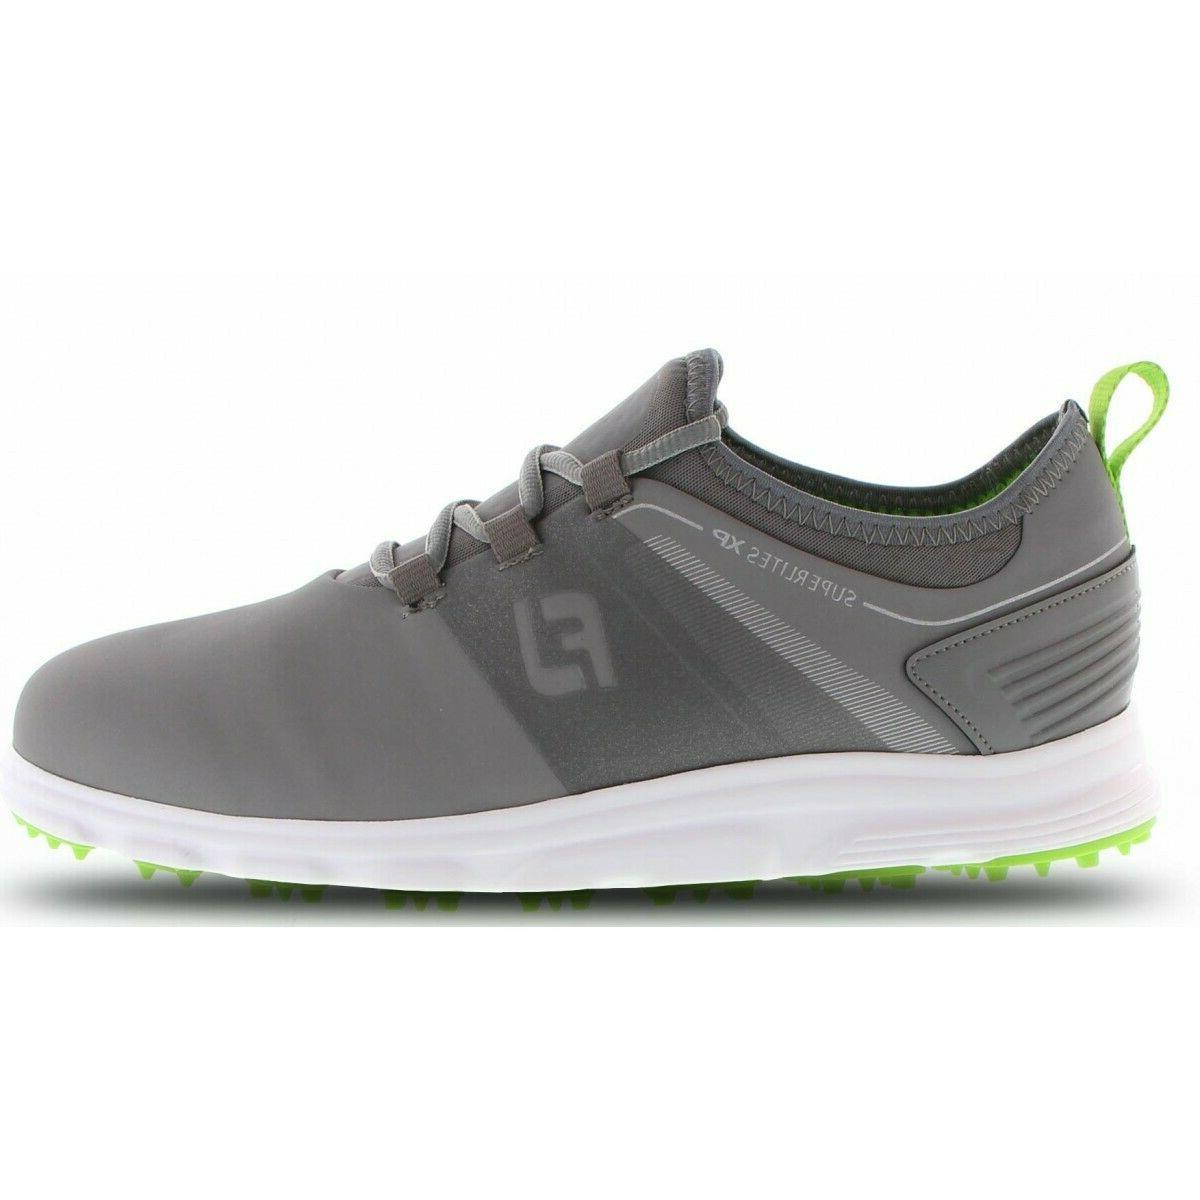 New SuperLites Golf Choose Size Super Lite